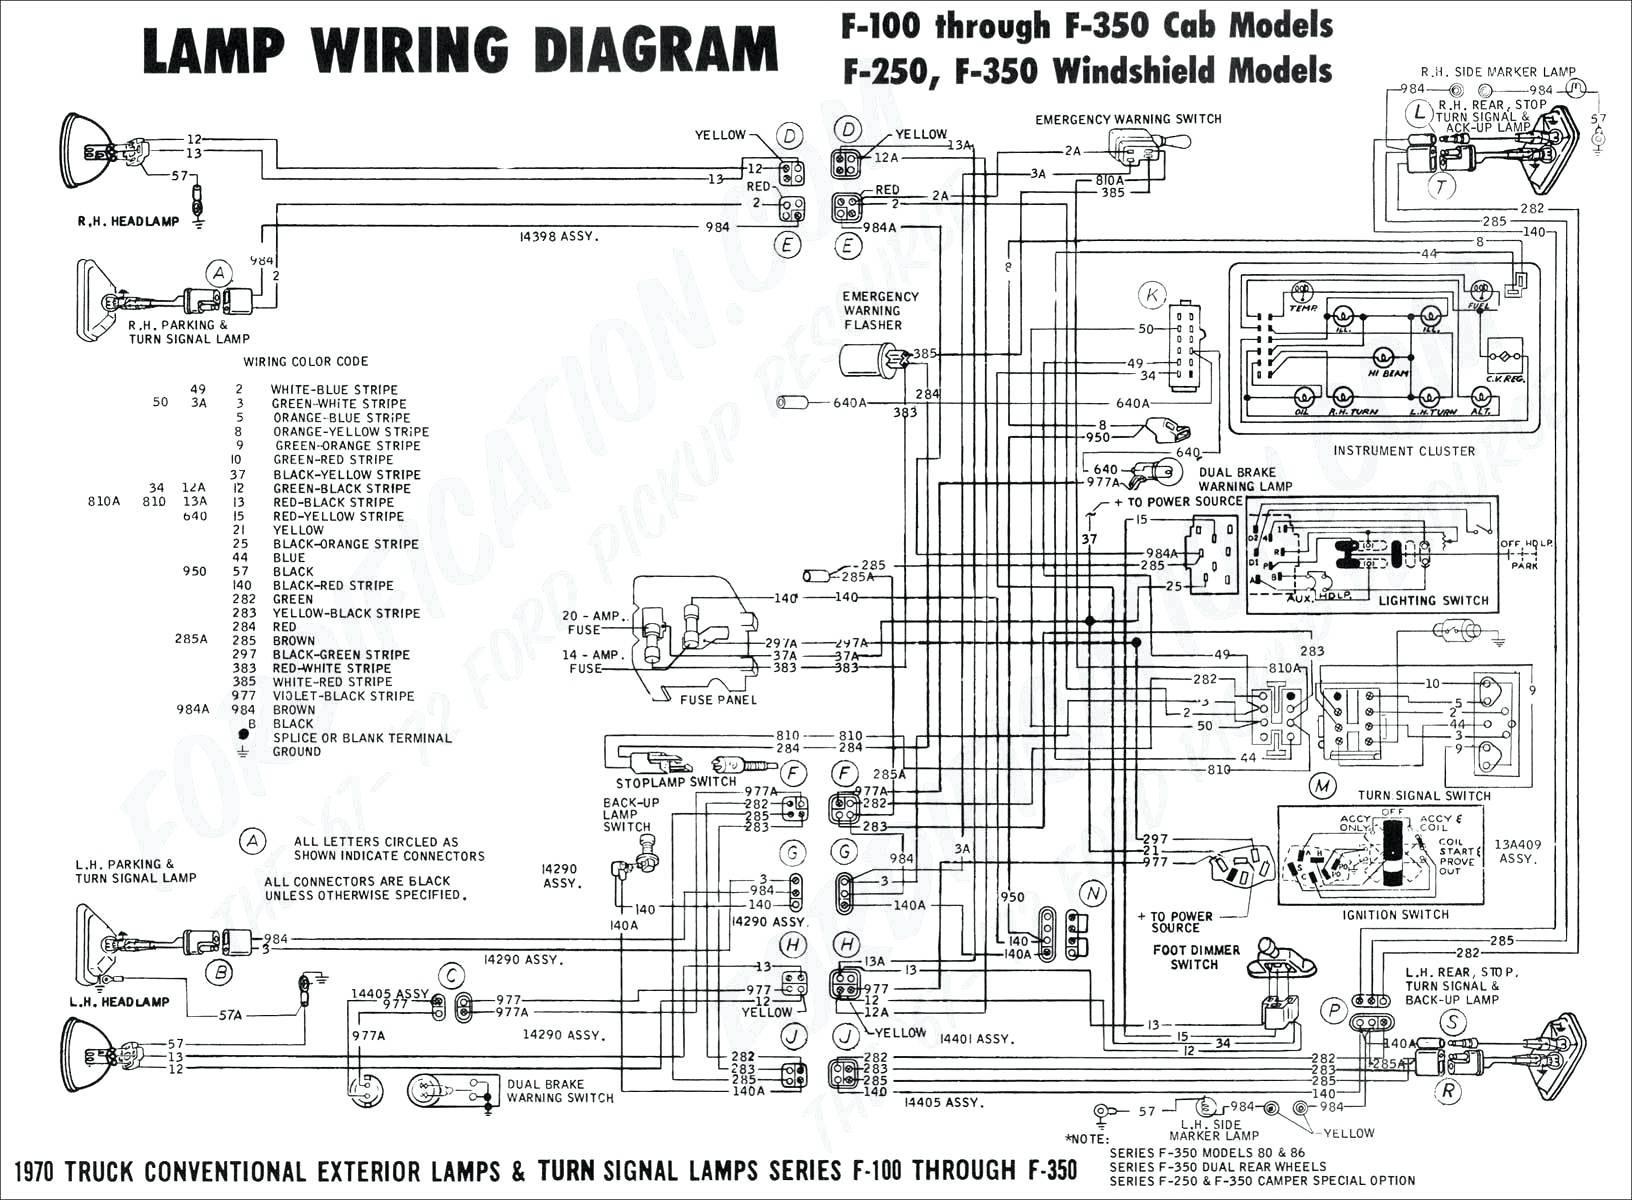 Subaru Forester Headlight Wiring Diagram